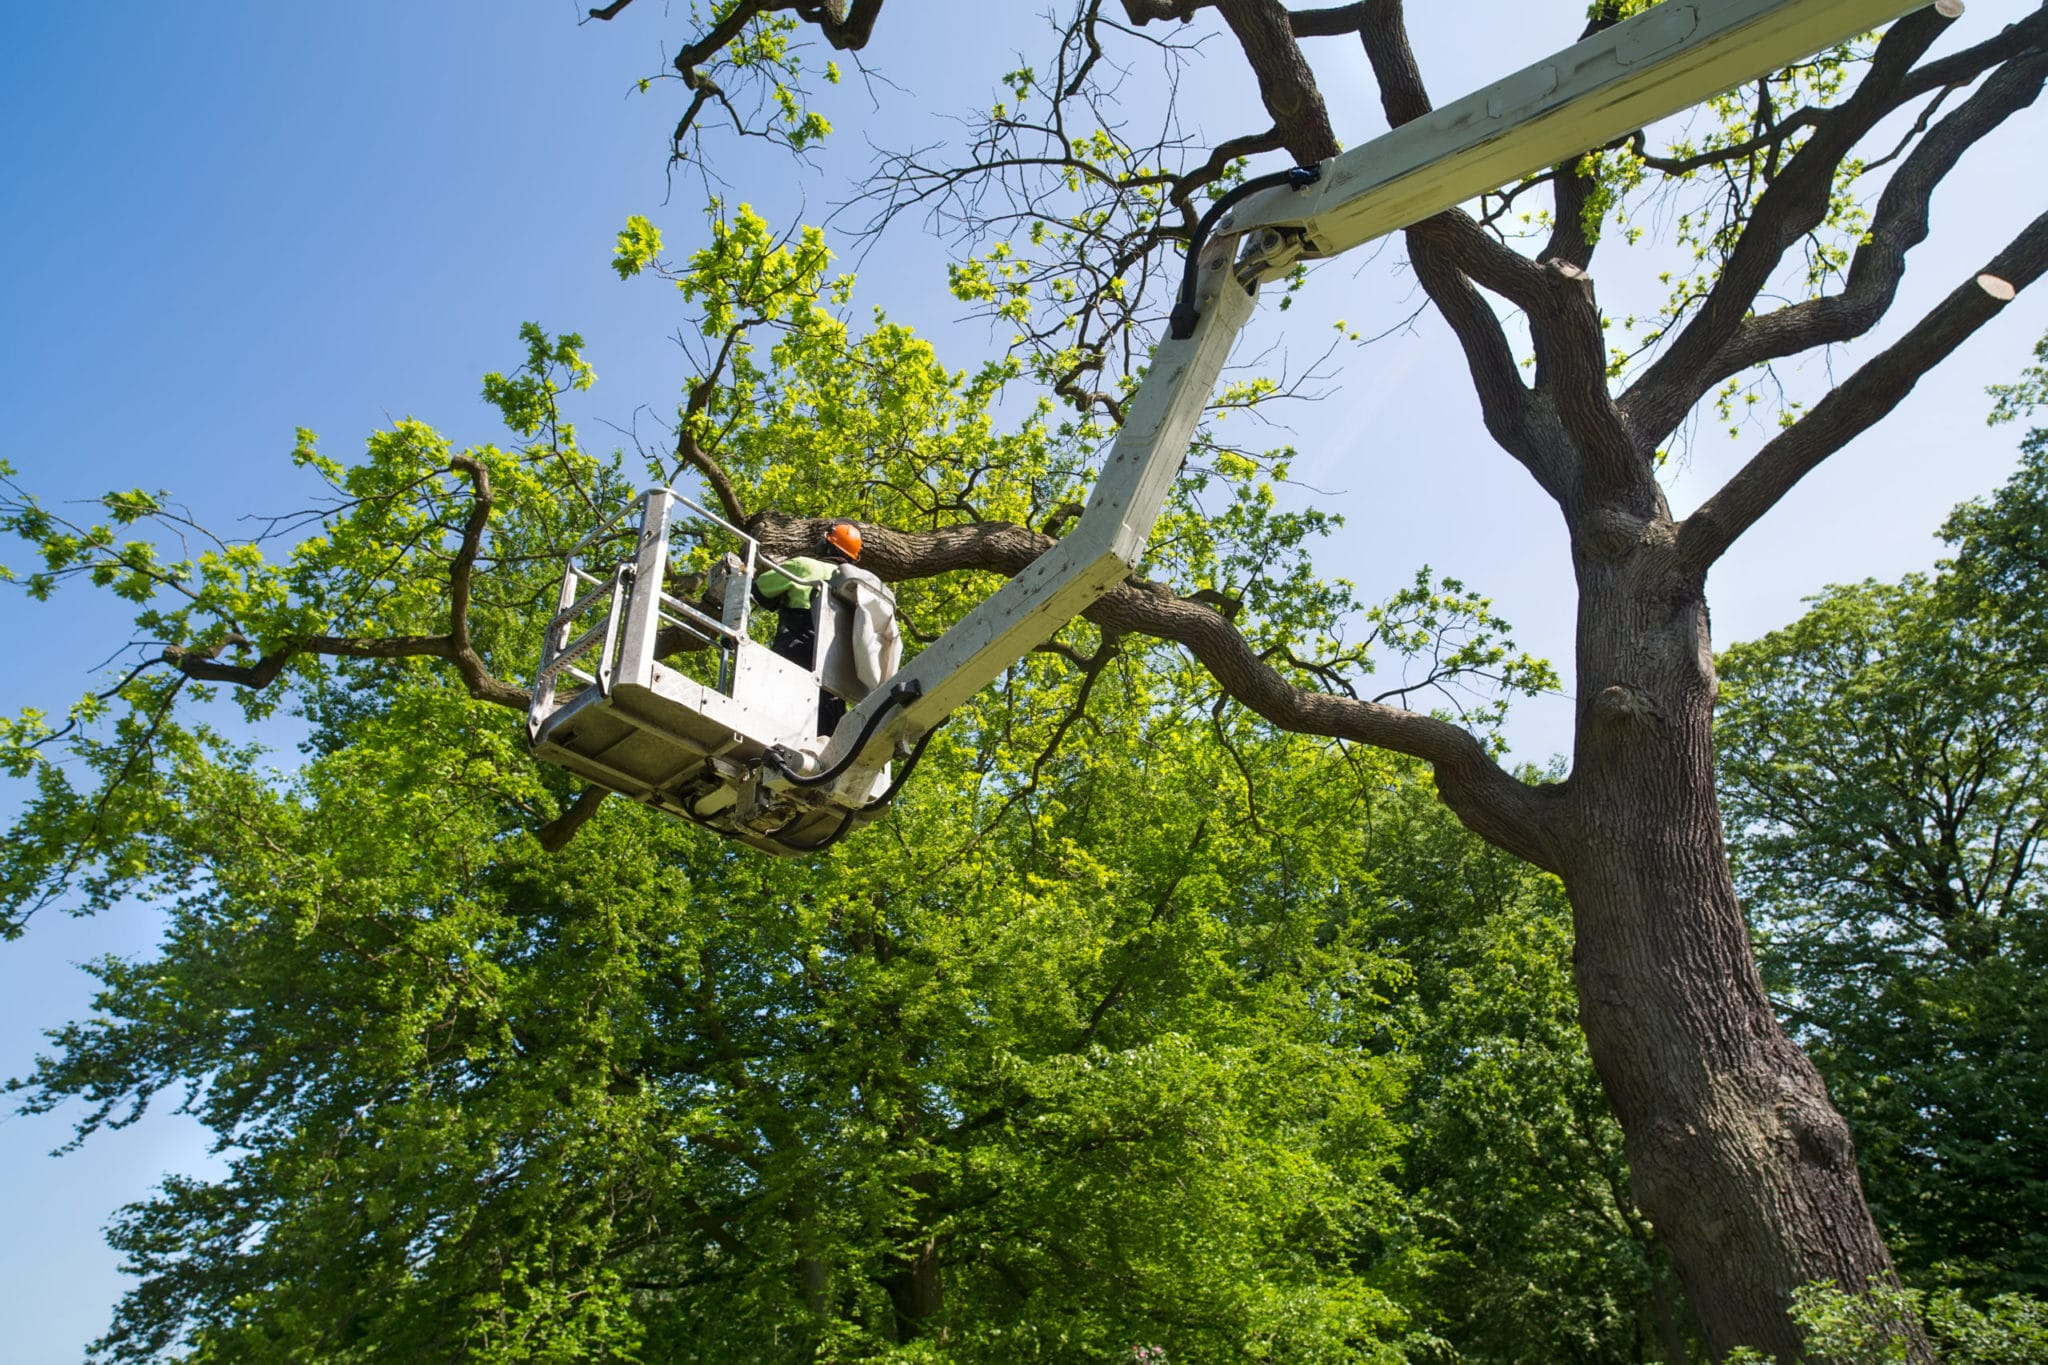 aanbesteding groenwerkzaamheden gemeente rotterdam